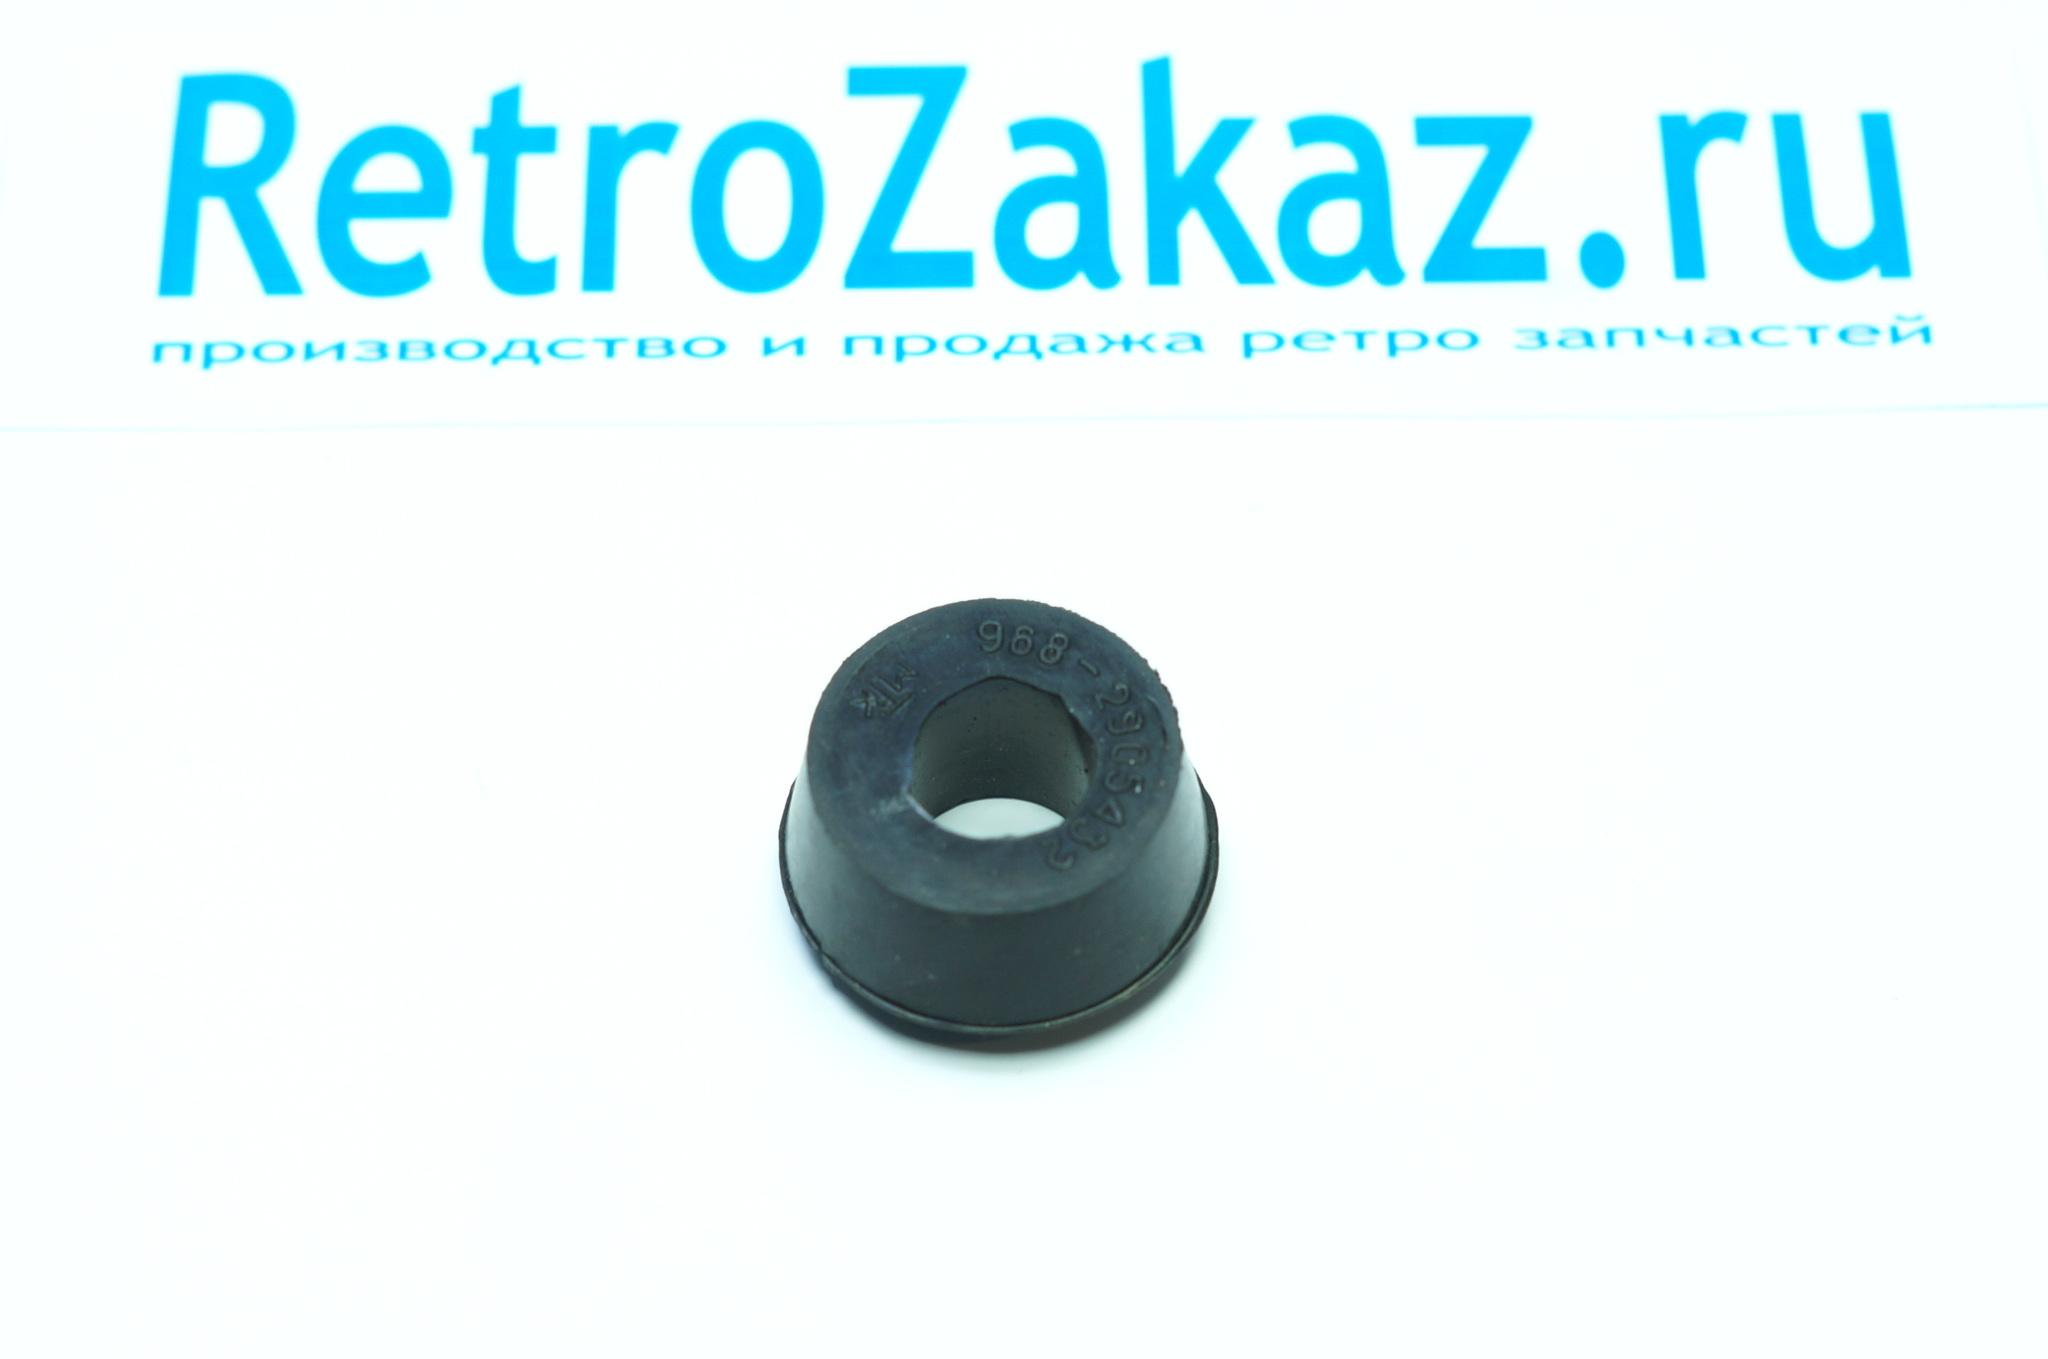 Втулка амортизатора передней подвески Заз 968